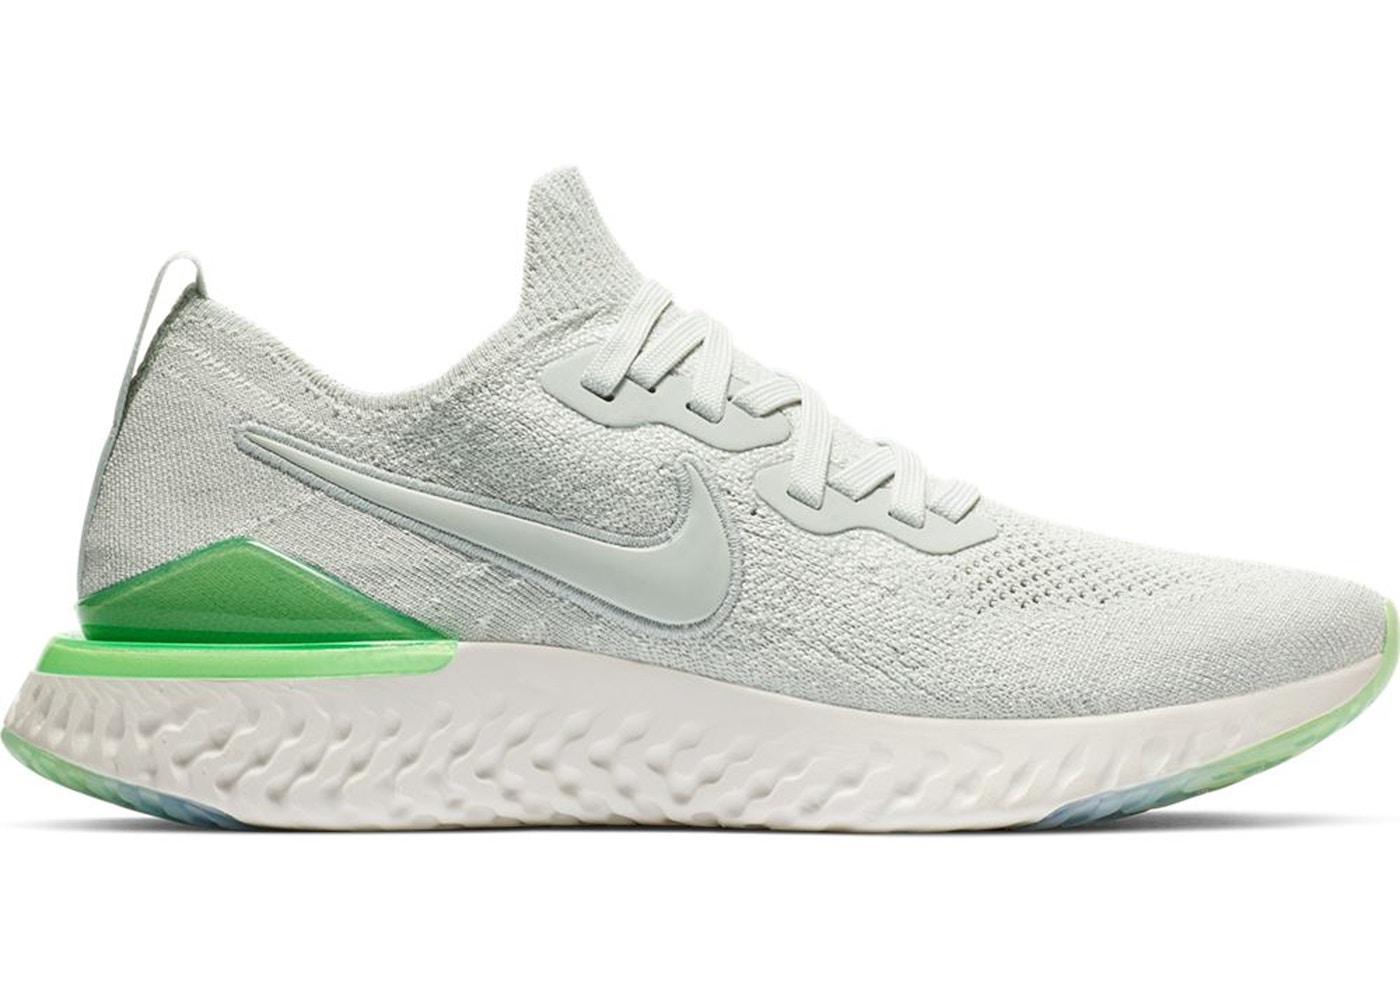 60c4c13e0c256 Nike Epic React Flyknit 2 Light Silver Lime Blast (W) - BQ8927-005